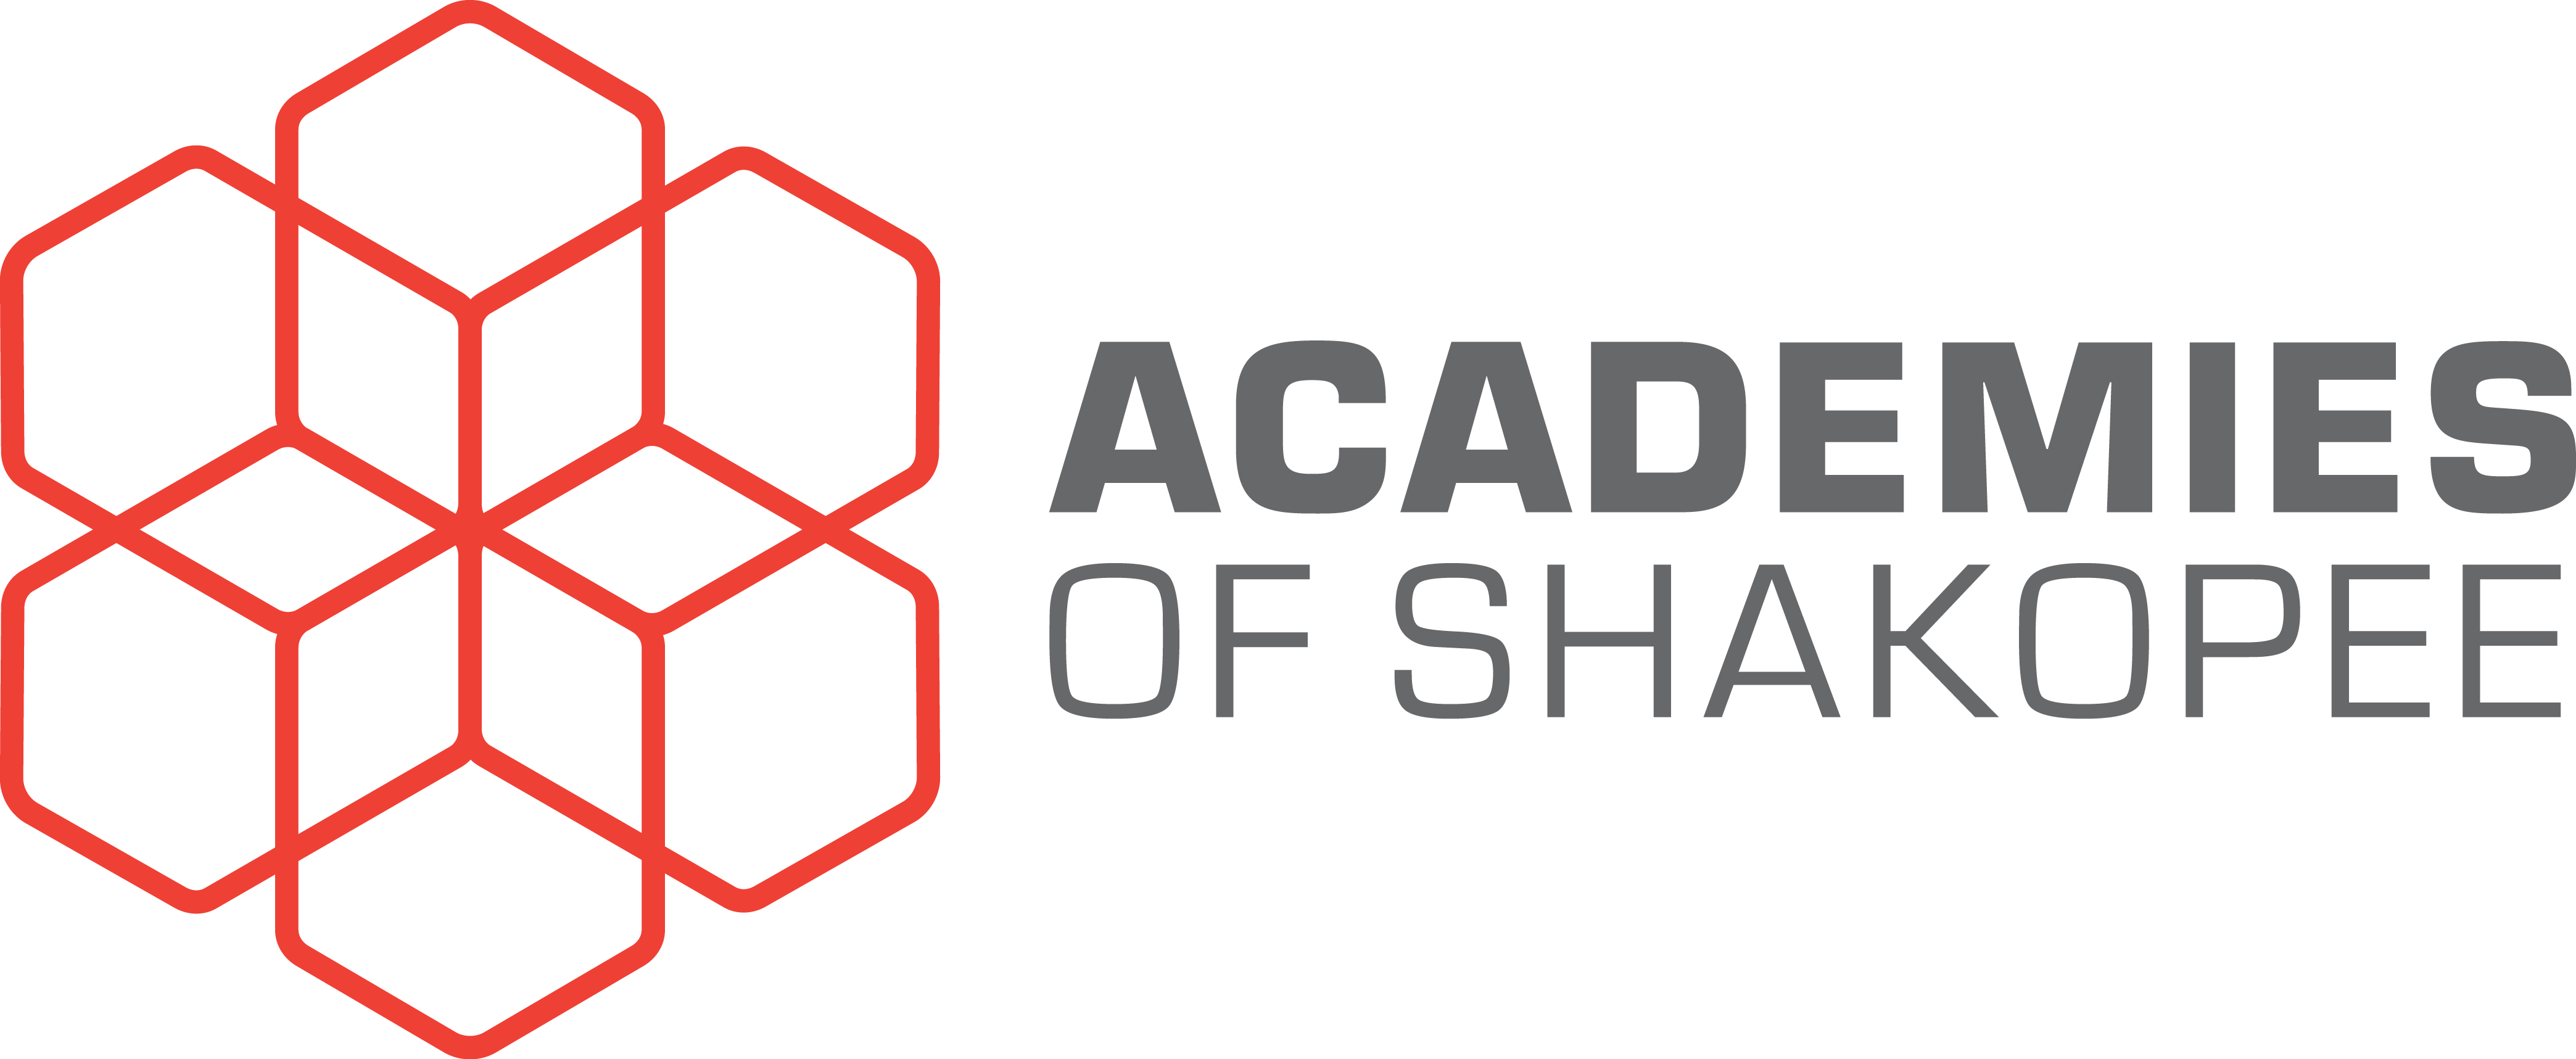 Shakopee Public Schools Wel e to Shakopee Public Schools